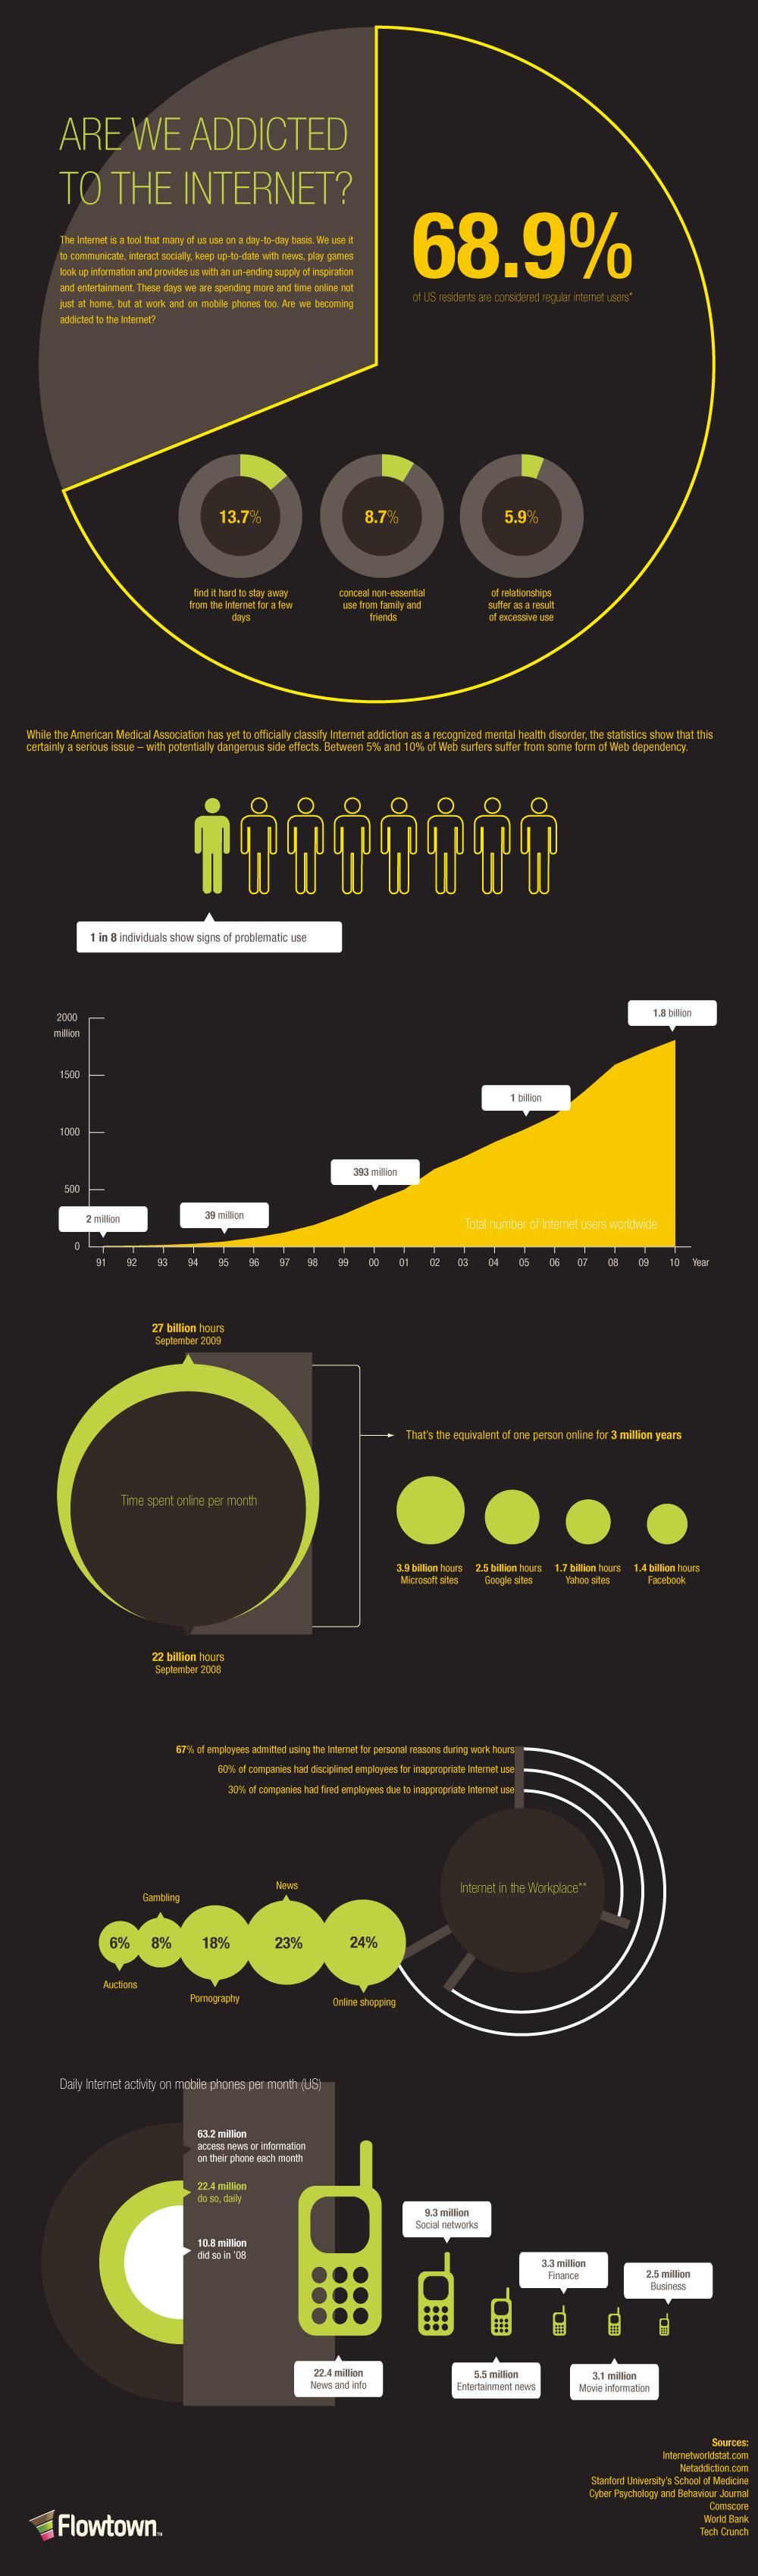 Internet Addiction Statistics Infographic